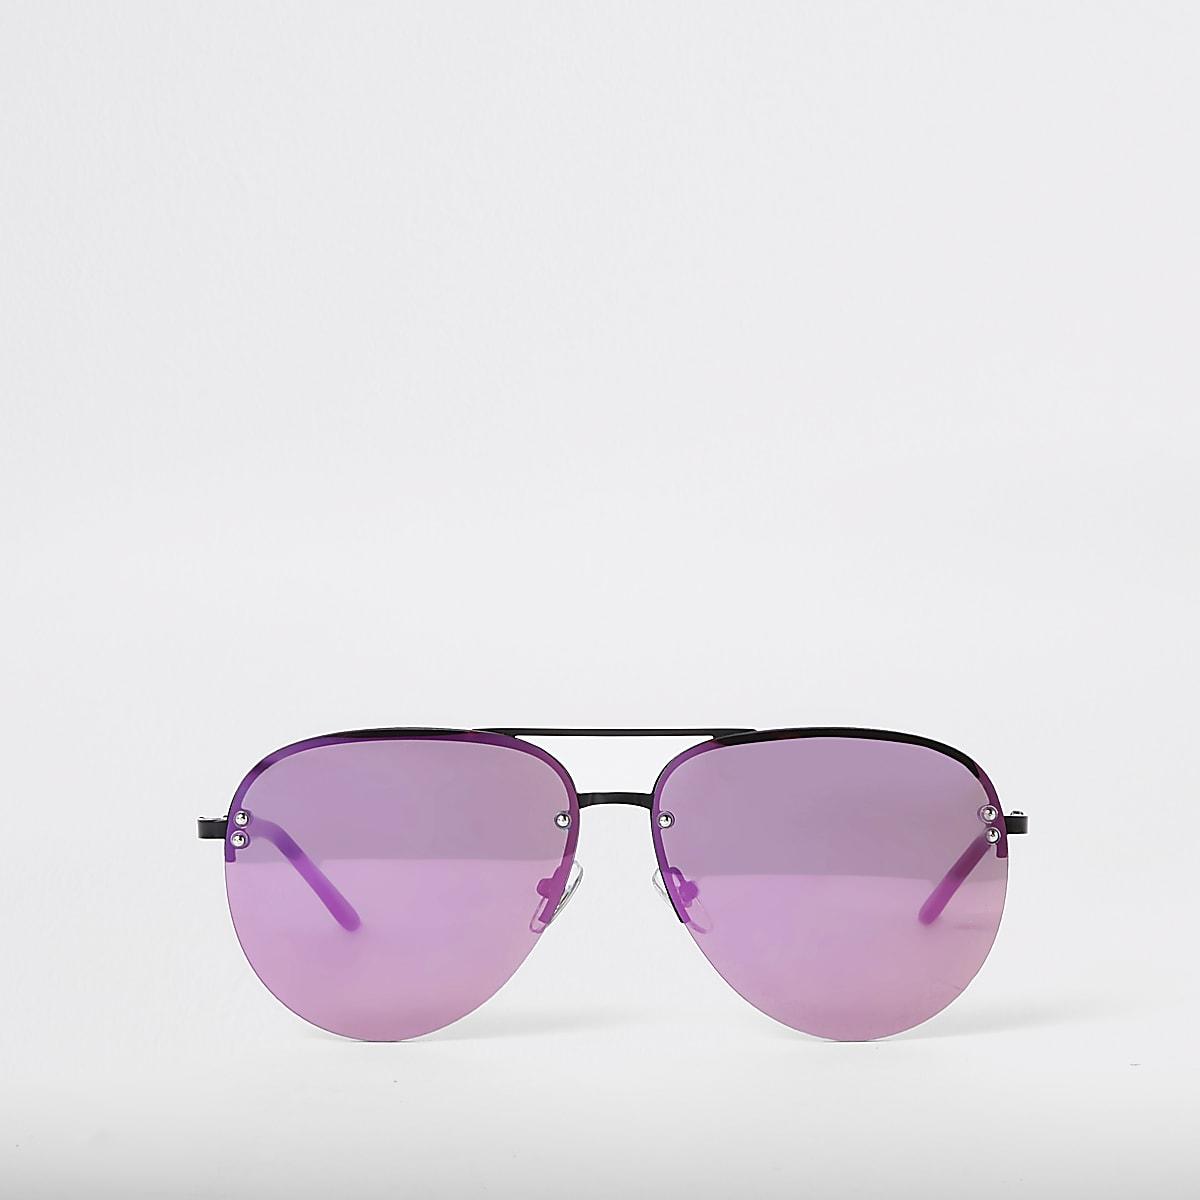 3266f91f01 Purple lens aviator sunglasses - Aviator Sunglasses - Sunglasses - women